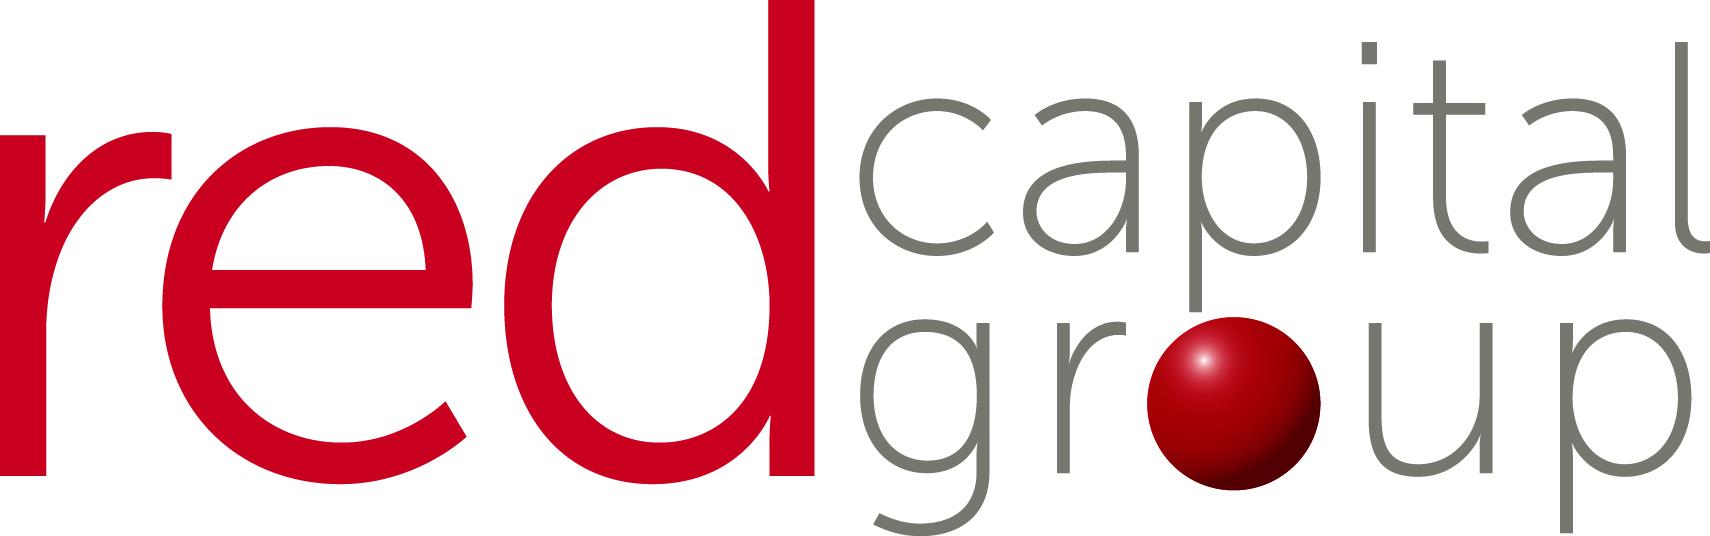 RCG-Logo-Final_OUTLINES-CMYK.jpg